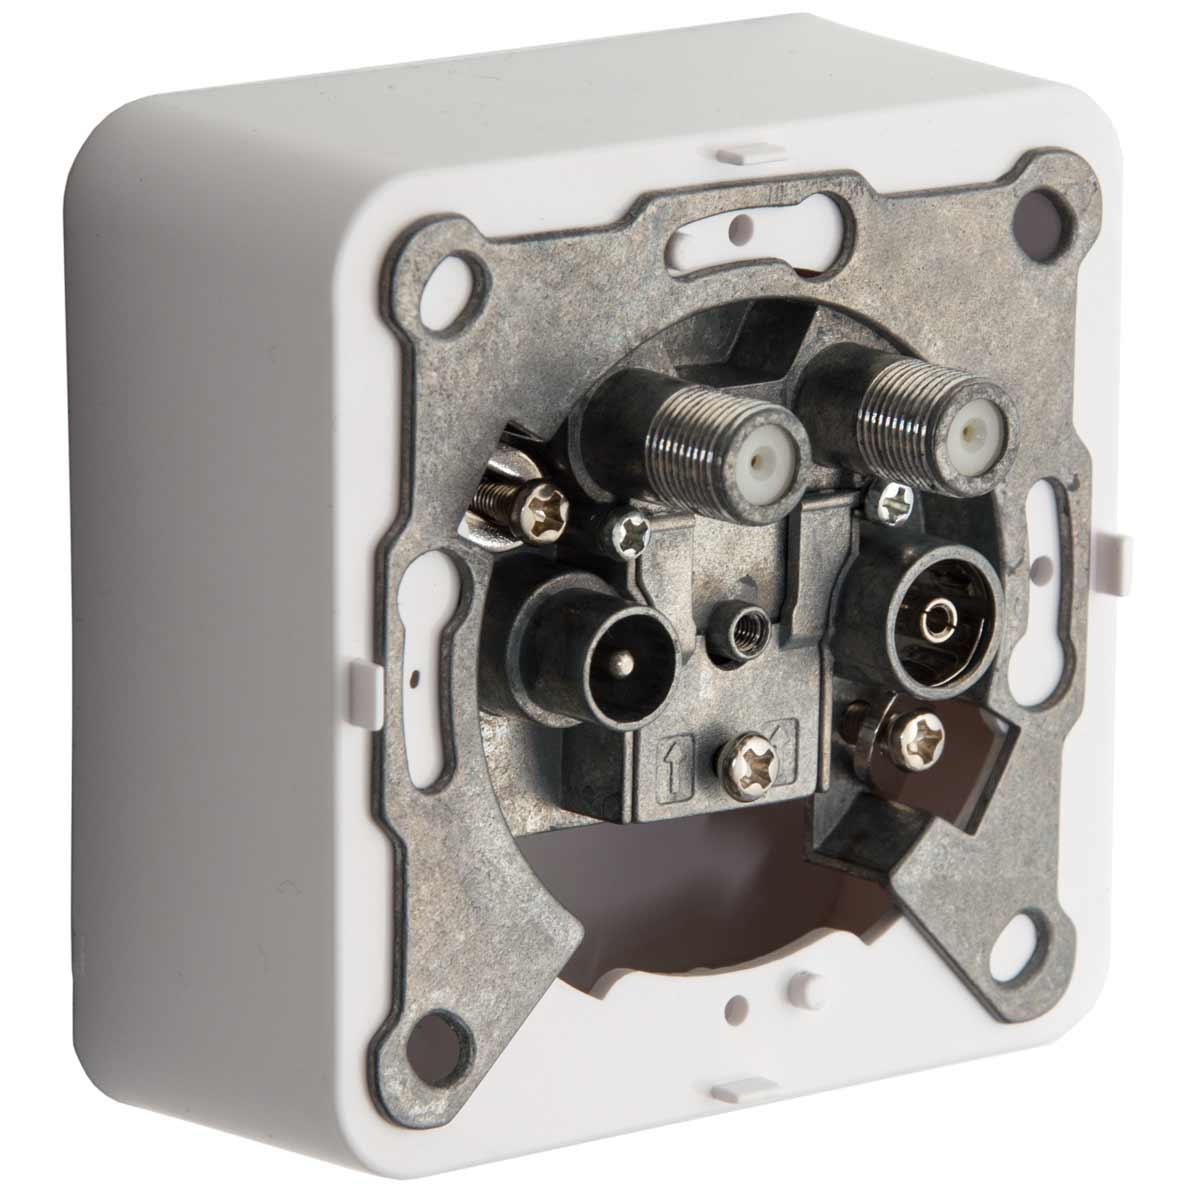 5x PremiumX PX-4 Sat Dose 4 Fach Enddose TWIN Antennendose CLASS A 2x Sat, 1x Radio, 1xTV DIGITAL FULLHD 3D